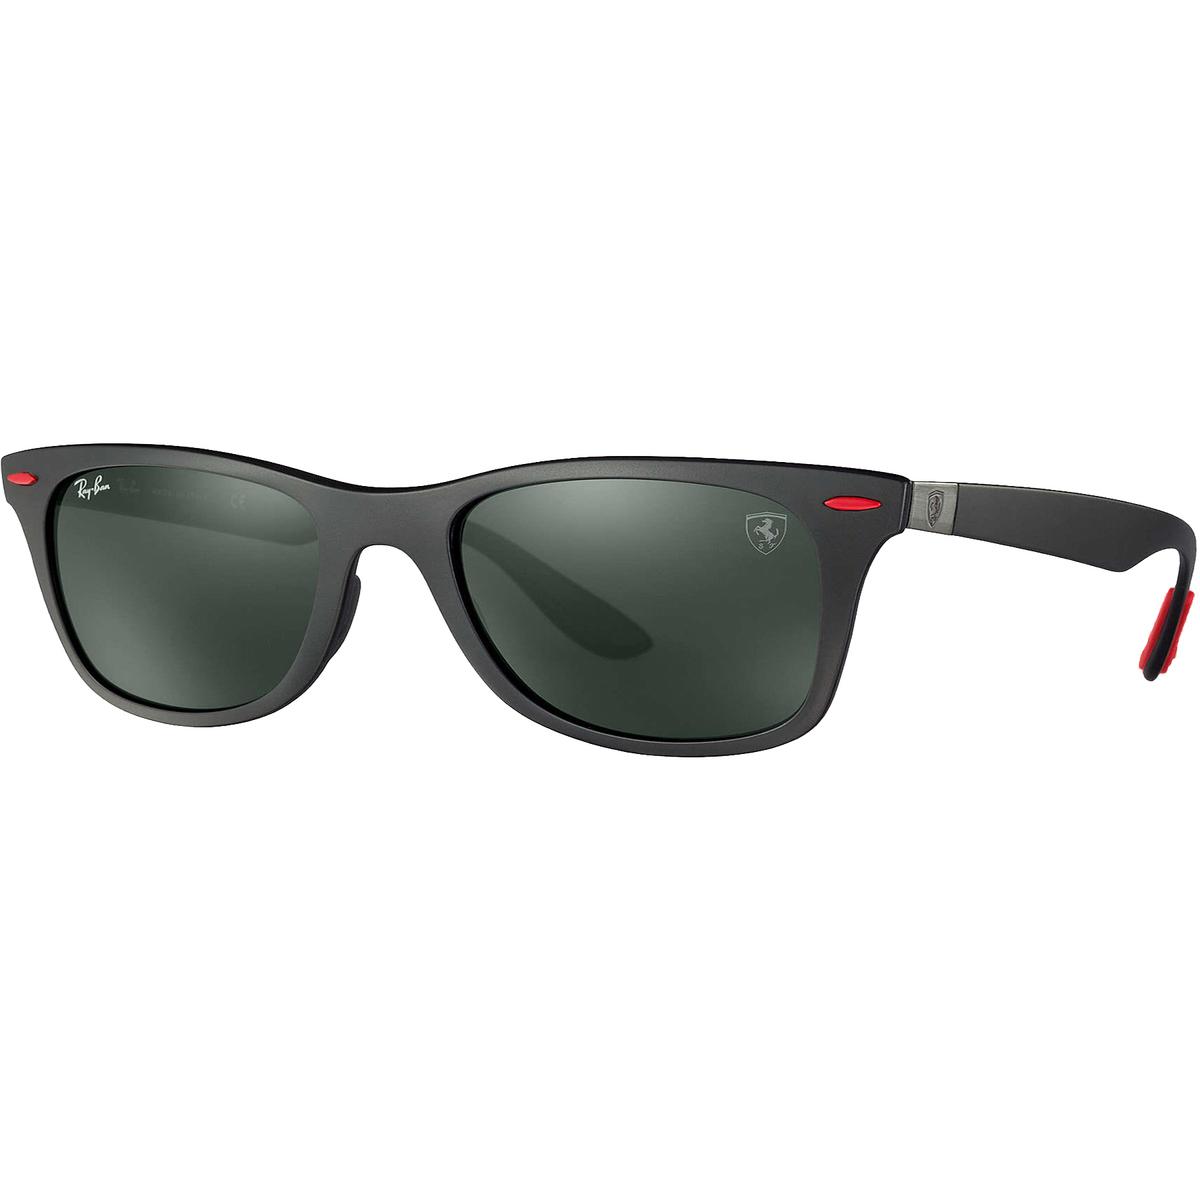 a411d7ea4556 Ray-Ban RM4195M Scuderia Ferrari Collection - Black Green Classic   0RB4195MF602715220